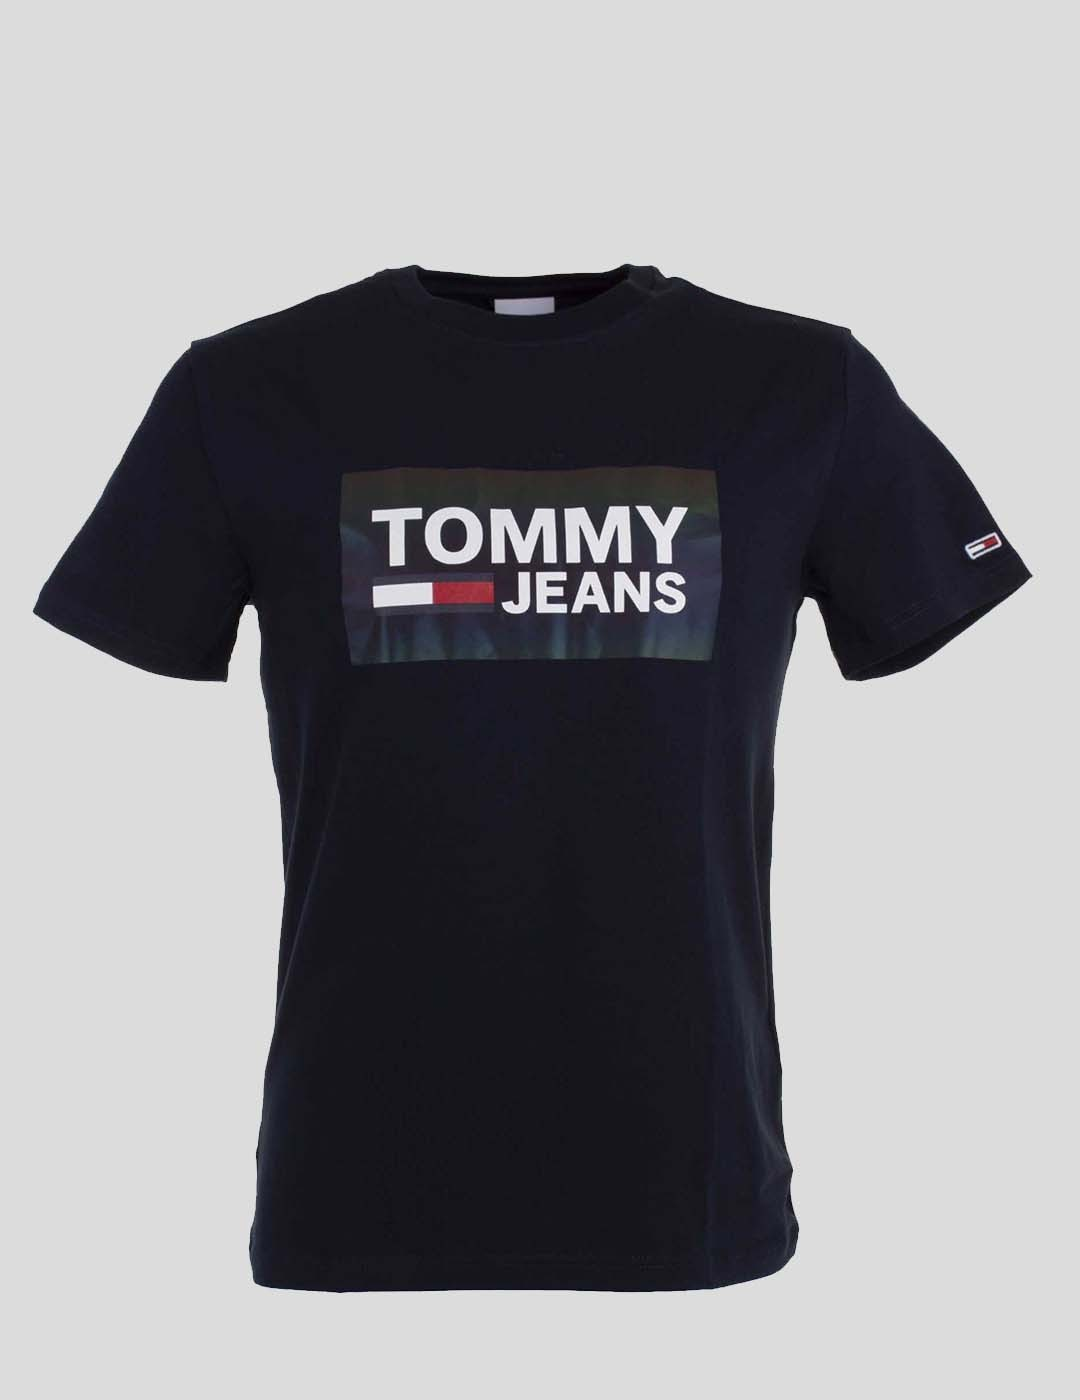 CAMISETA TOMMY JEANS STRETCH TEE CENTRE LOGO BLACK